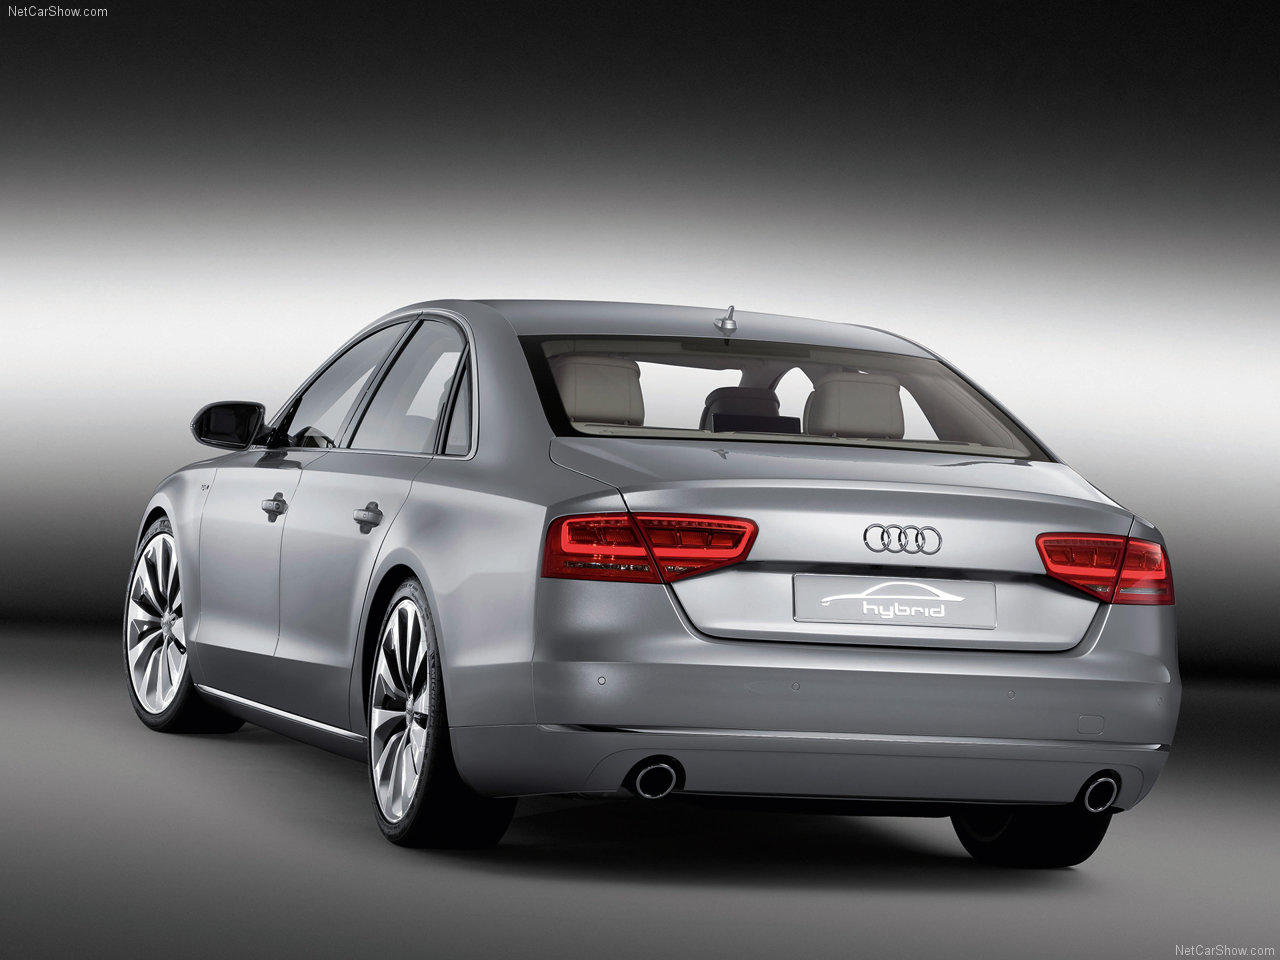 Audi-A8_Hybrid_Concept_2010_1280x960_wallpaper_05